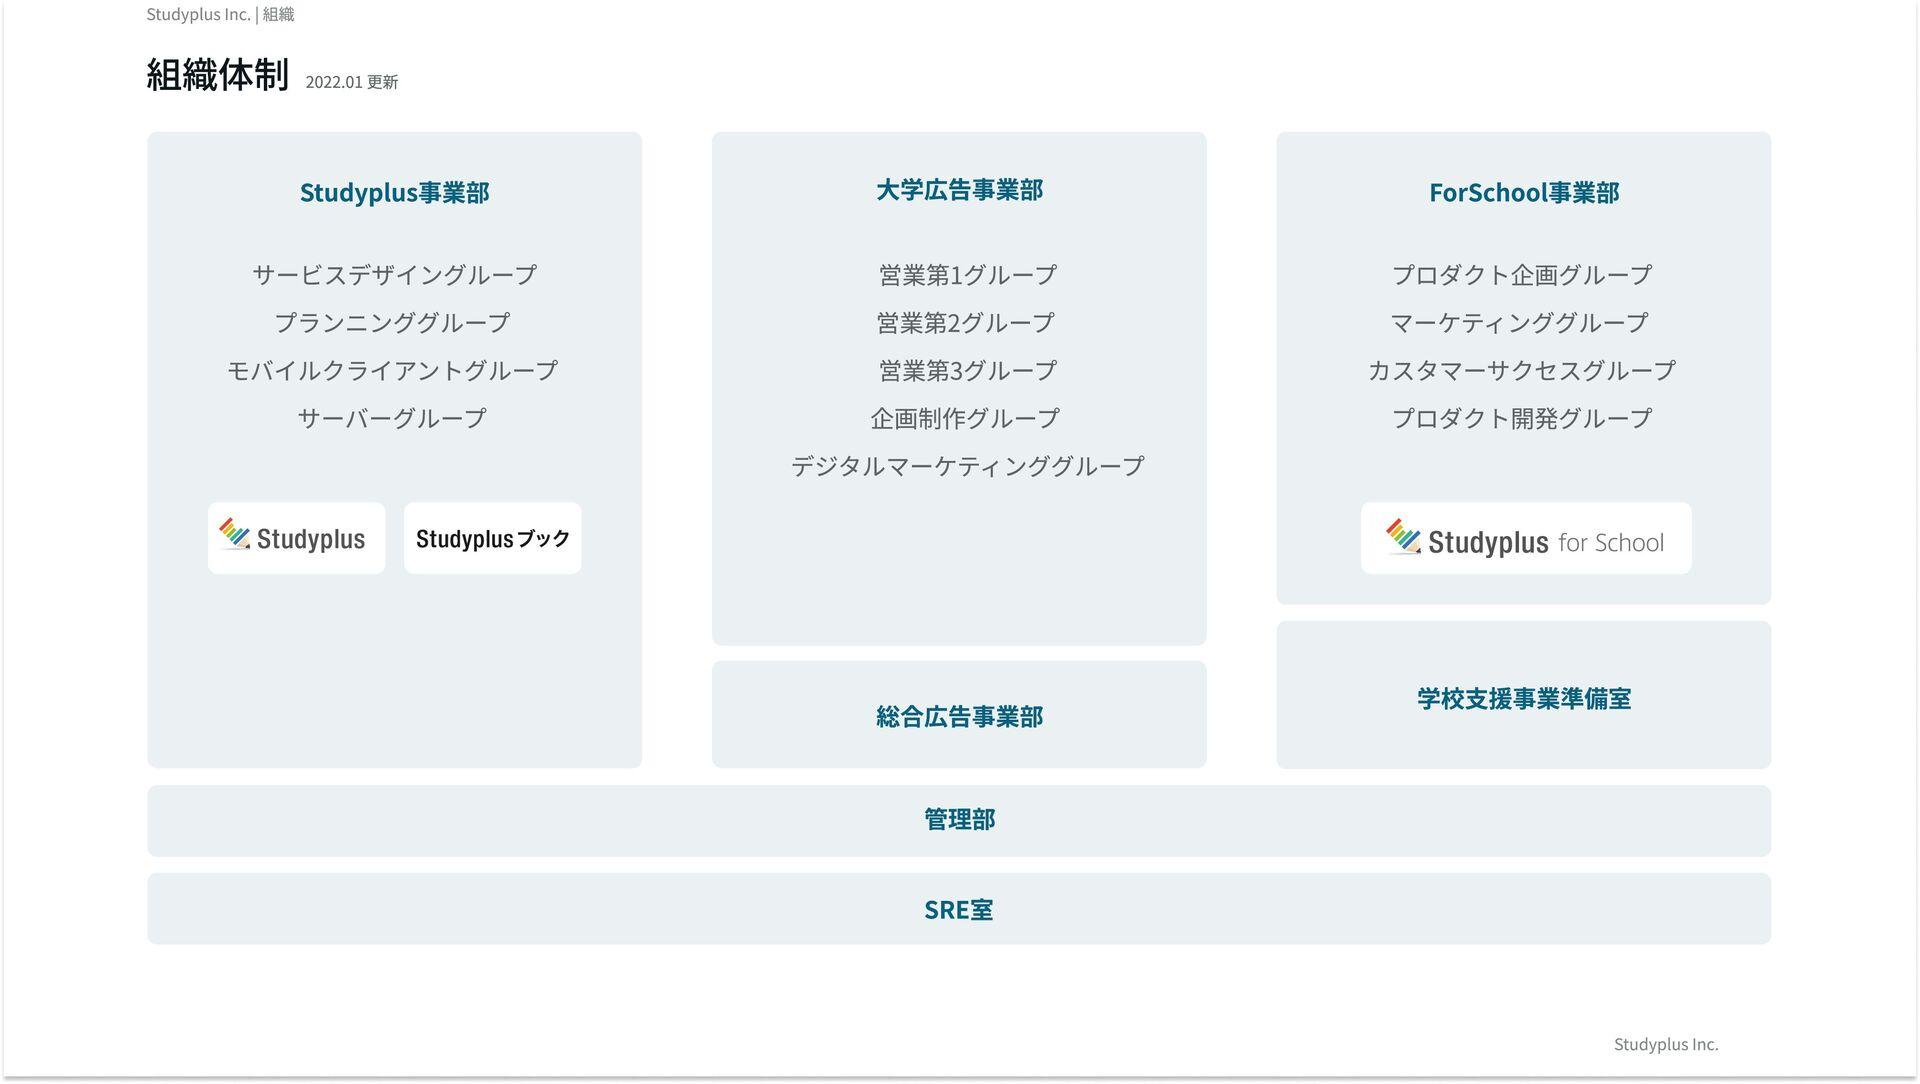 Studyplus事業部 サービスデザイングループ プランニンググループ モバイルクライアント...